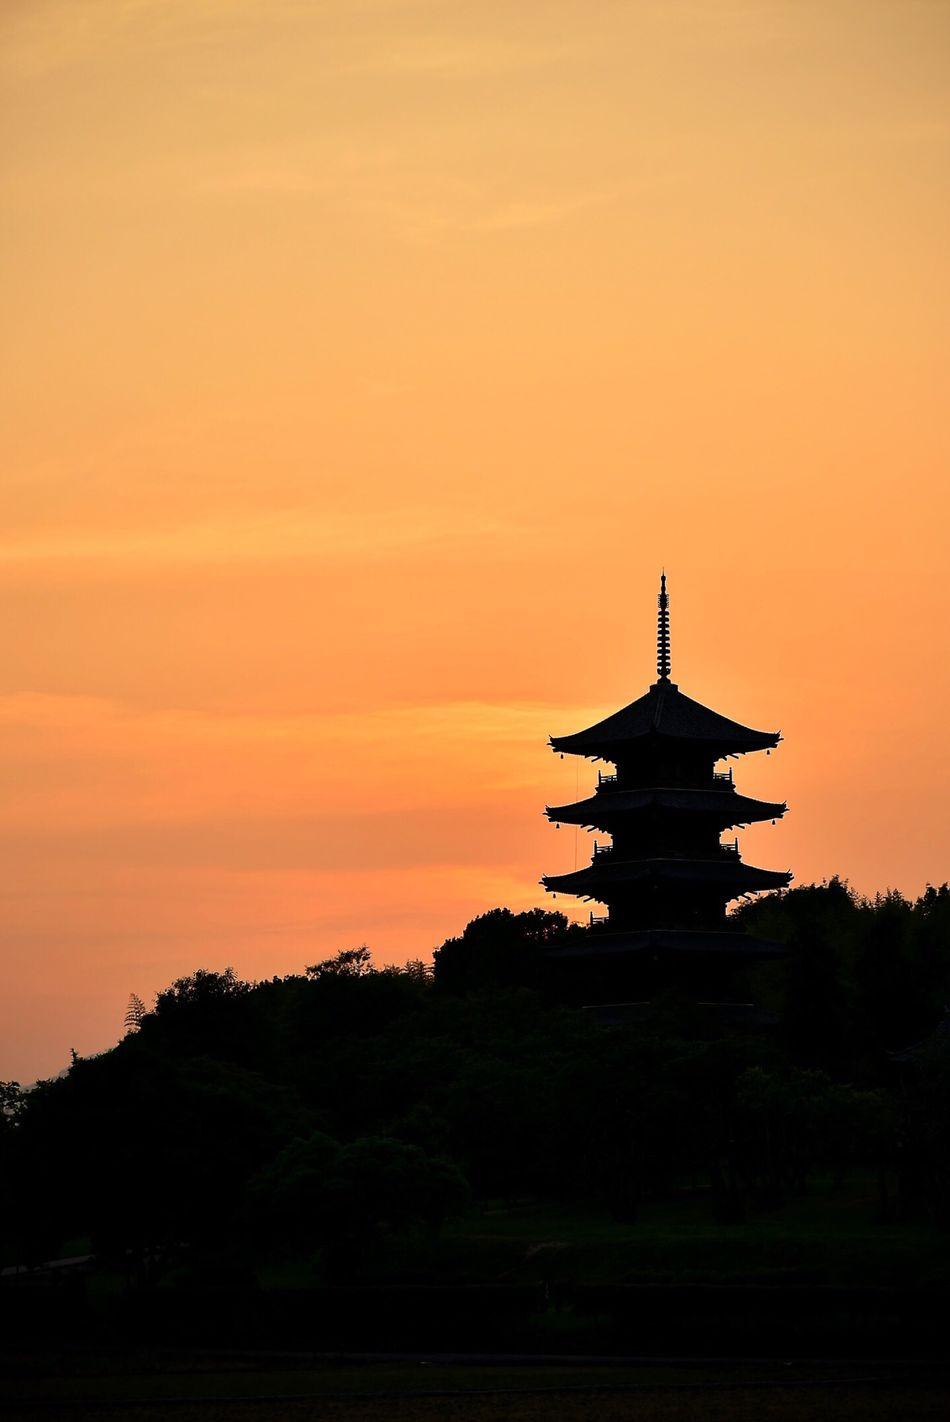 Okayama Nikon EyeEm Japan EyeEm Best Edits Taking Photos EyeEm Best Shots Landscape Five-storied Pagoda 備中国分寺 五重塔 Sunset Temple Evening View